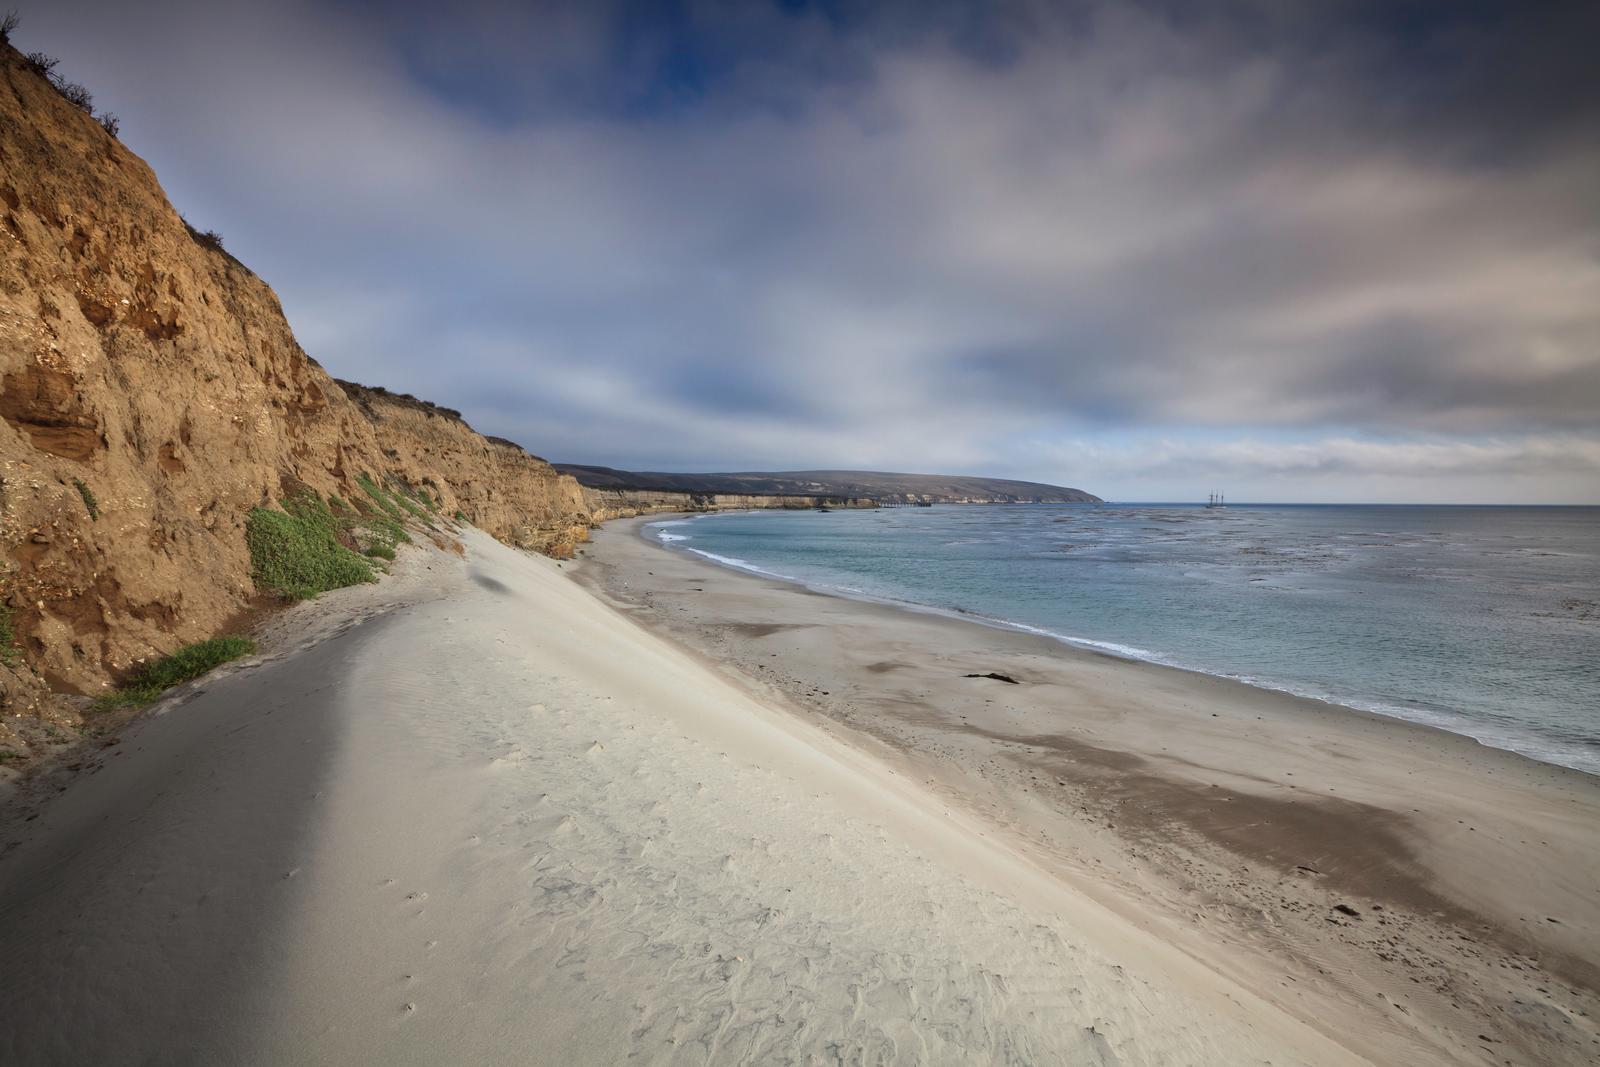 White sand dune next to a steep coastal bluff with ocean. Water Canyon Beach, Santa Rosa Island